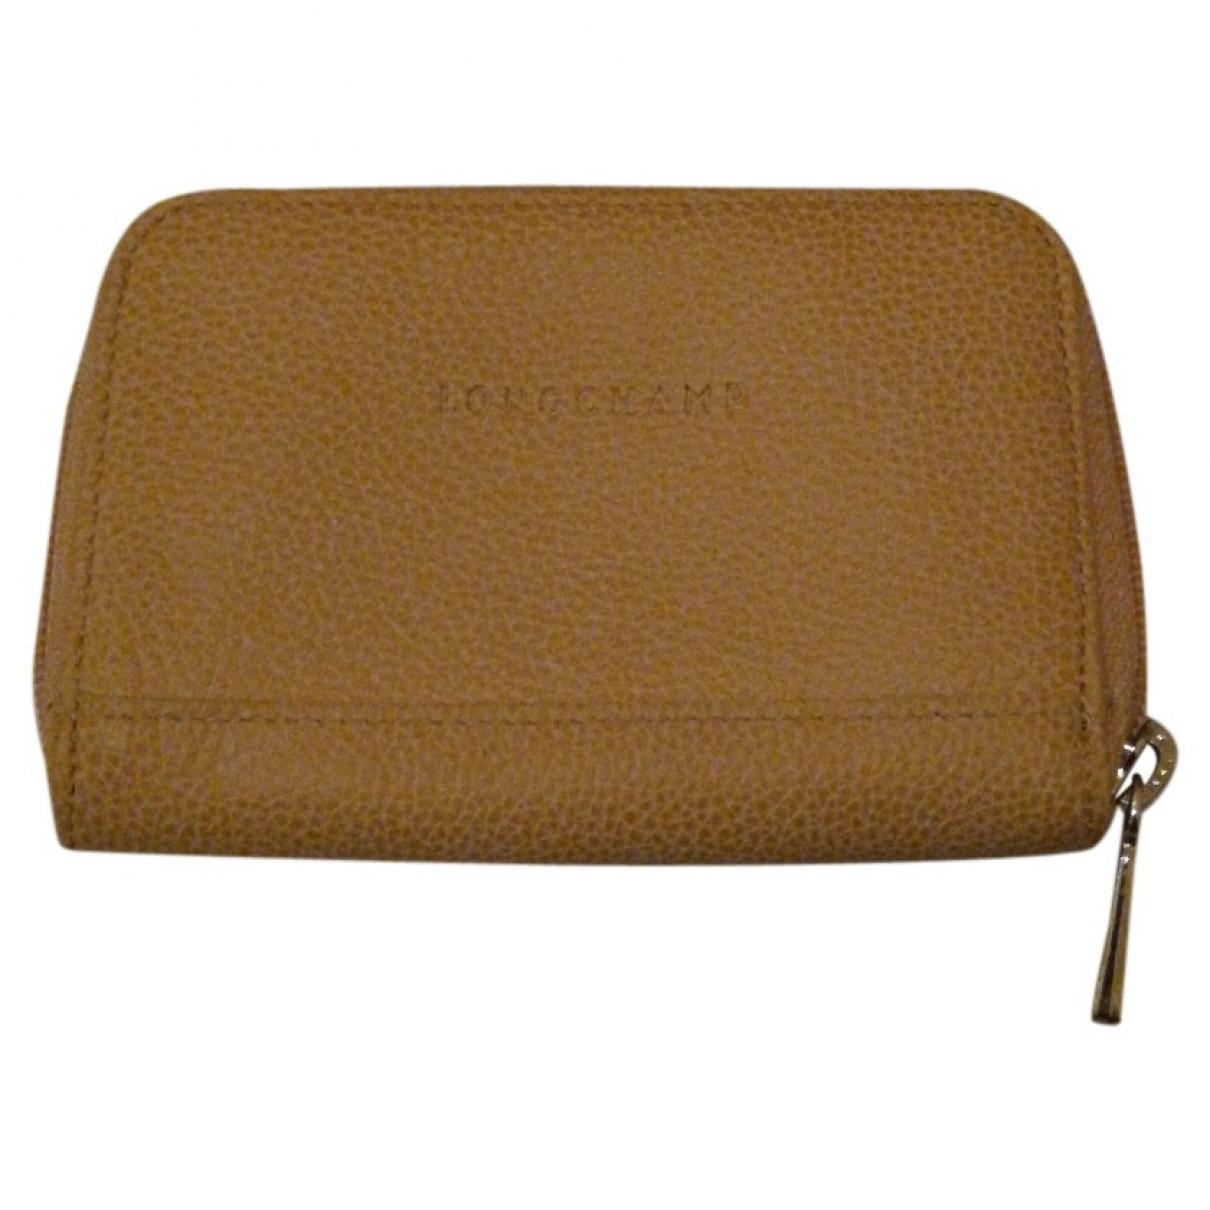 Longchamp \N Beige Leather Purses, wallet & cases for Women \N